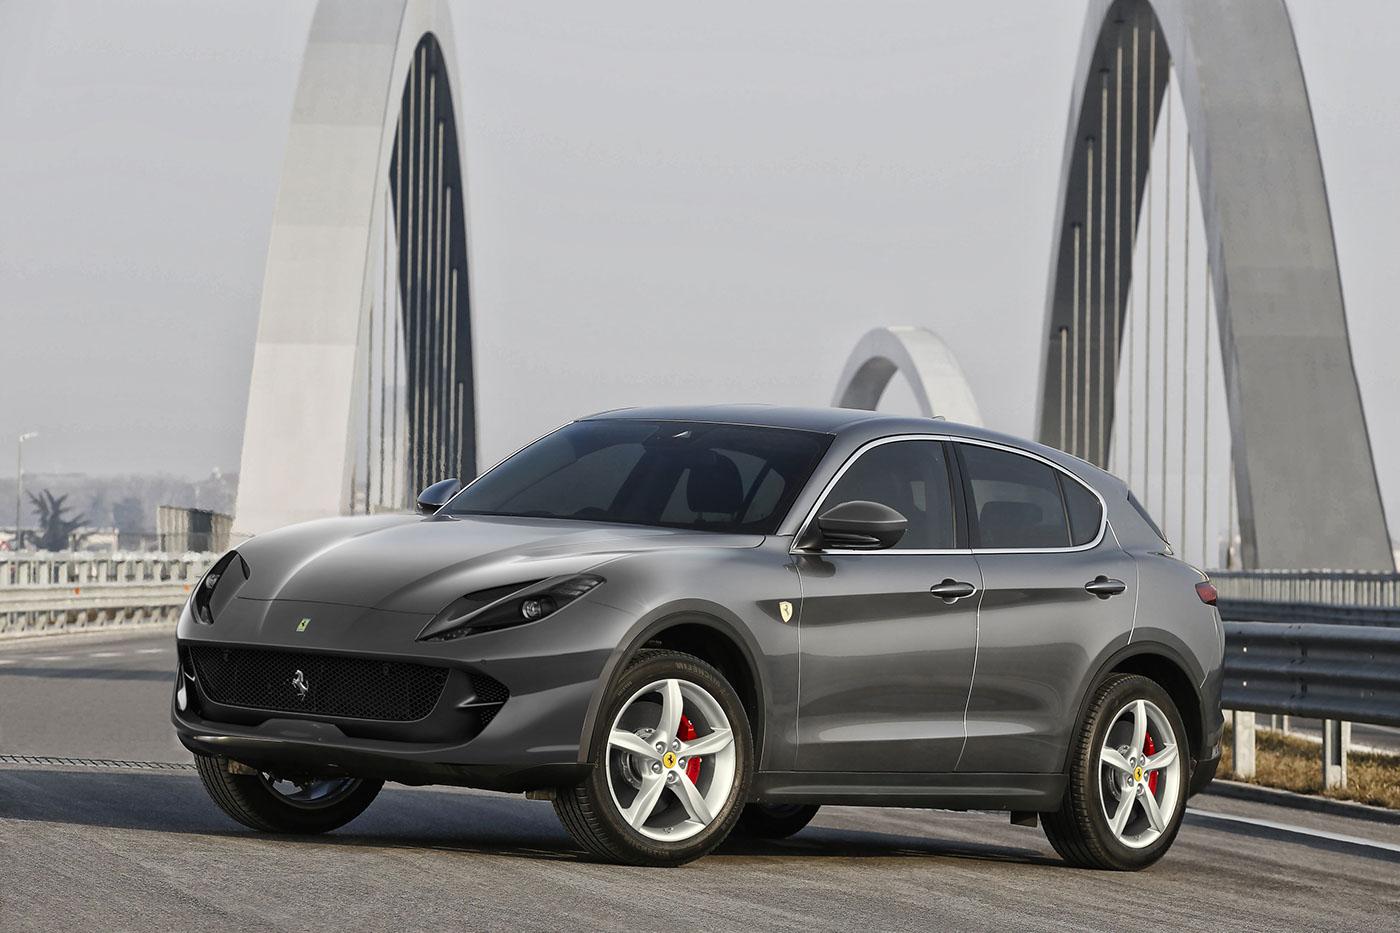 Ferrari will build an electric supercar to take on Tesla